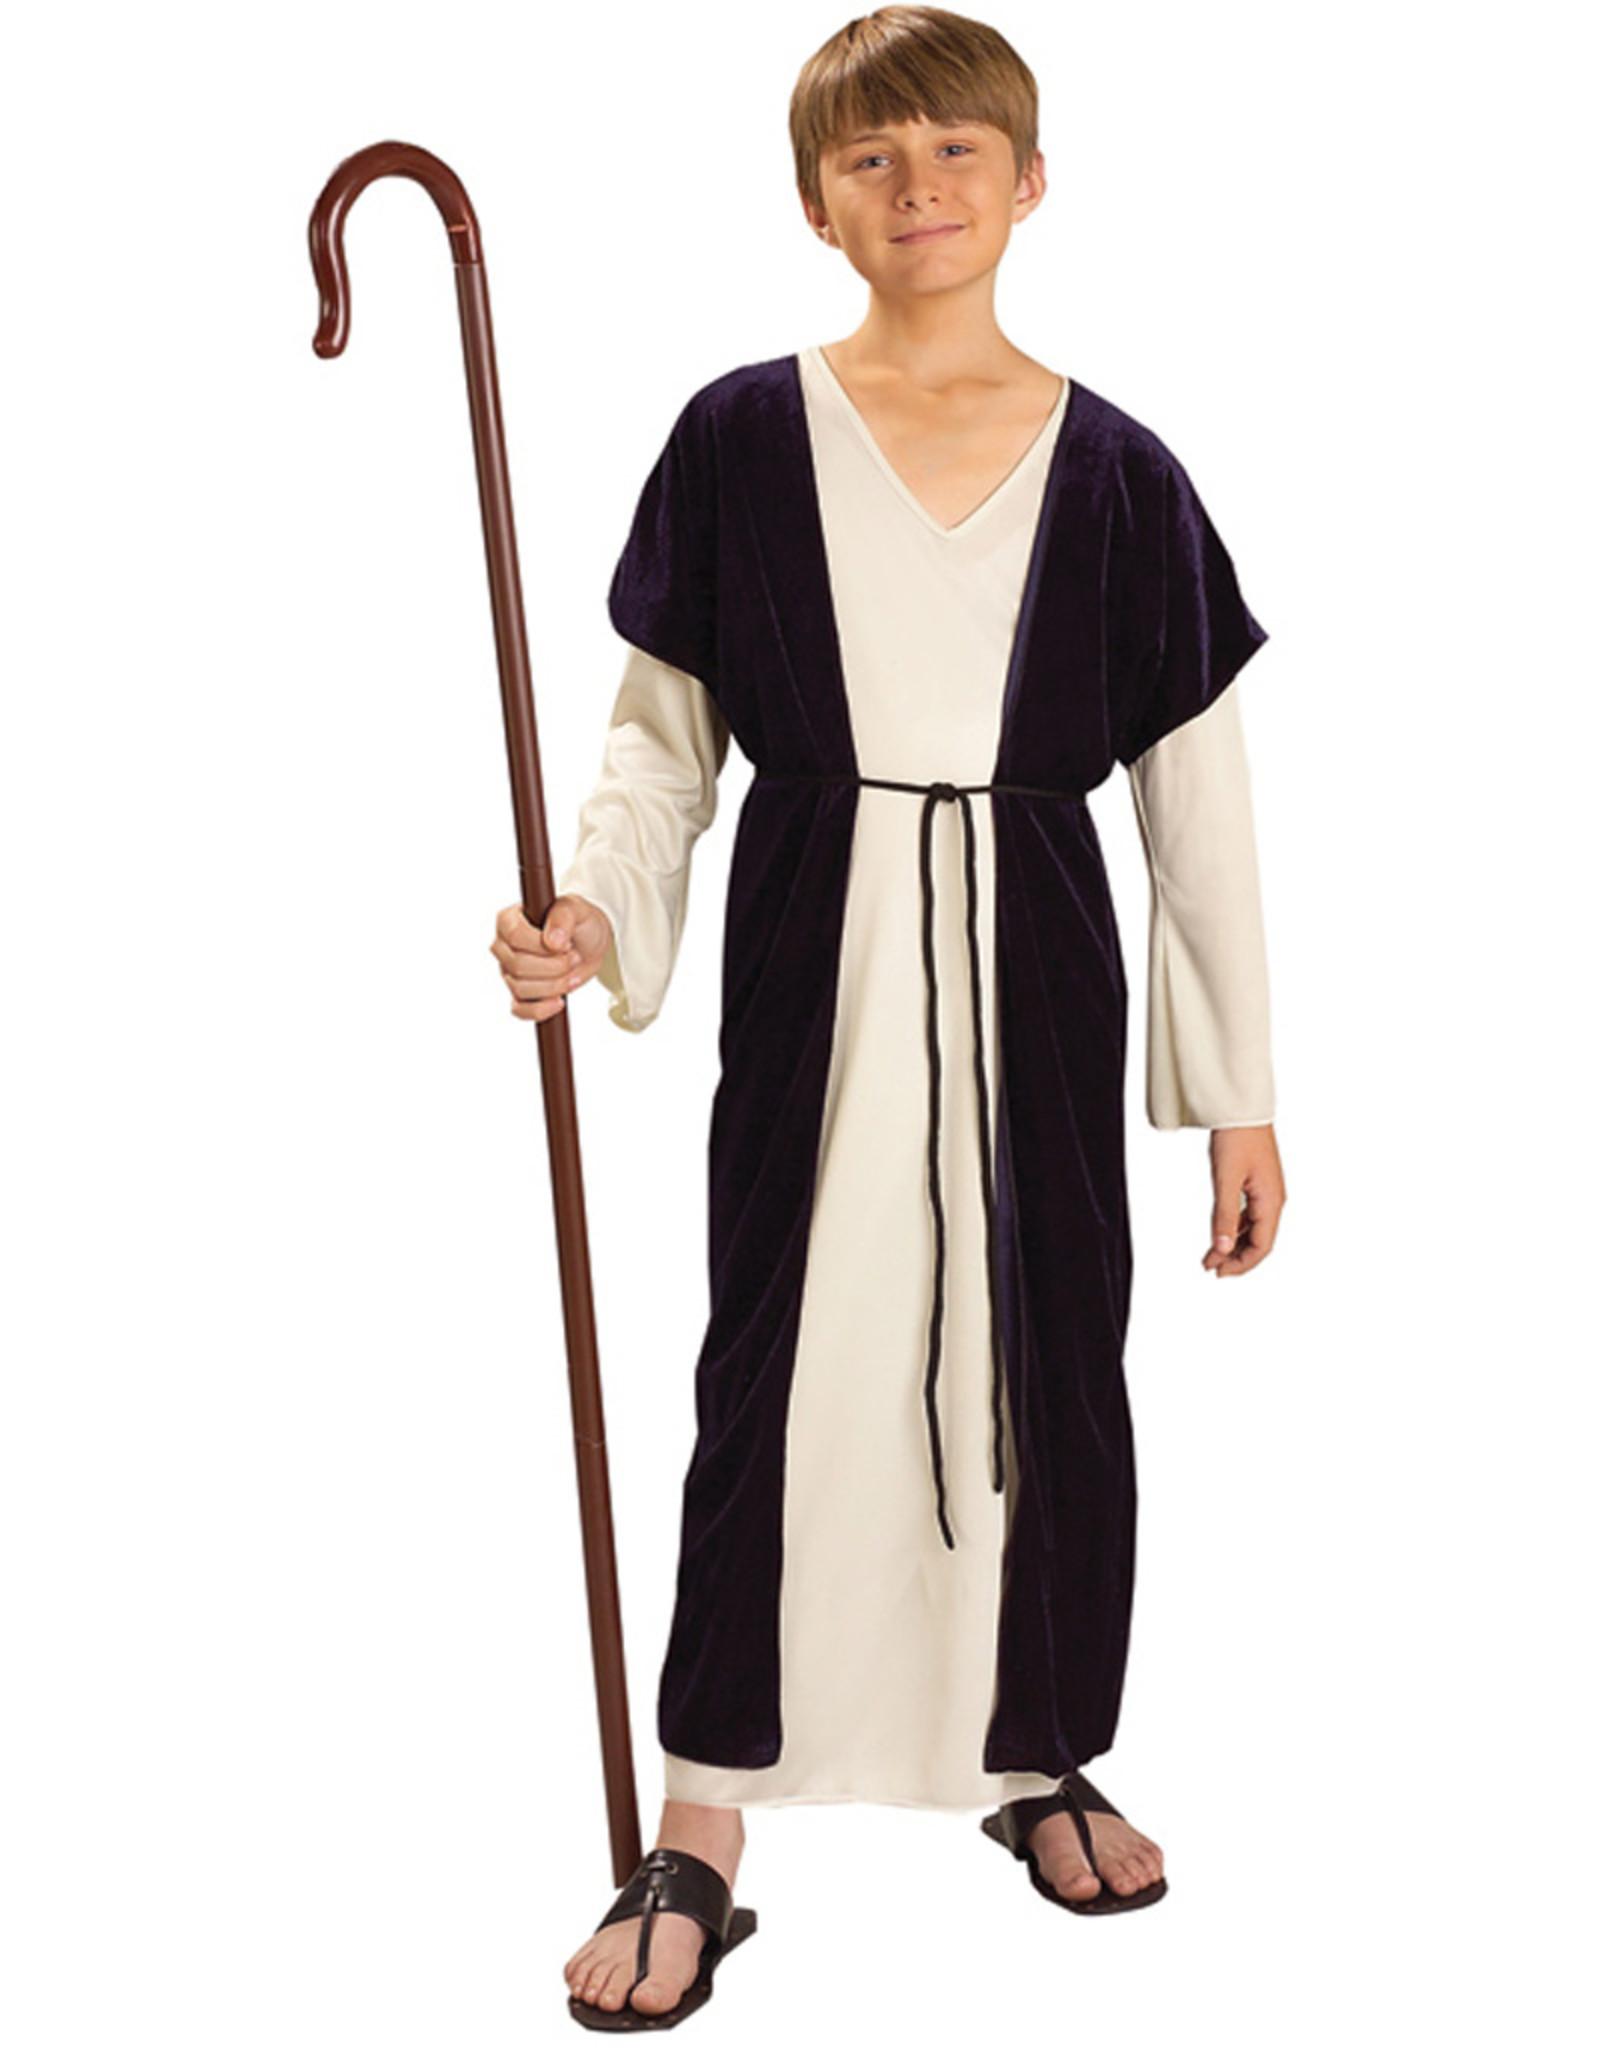 FORUM NOVELTIES Shepherd Costume - Boy's